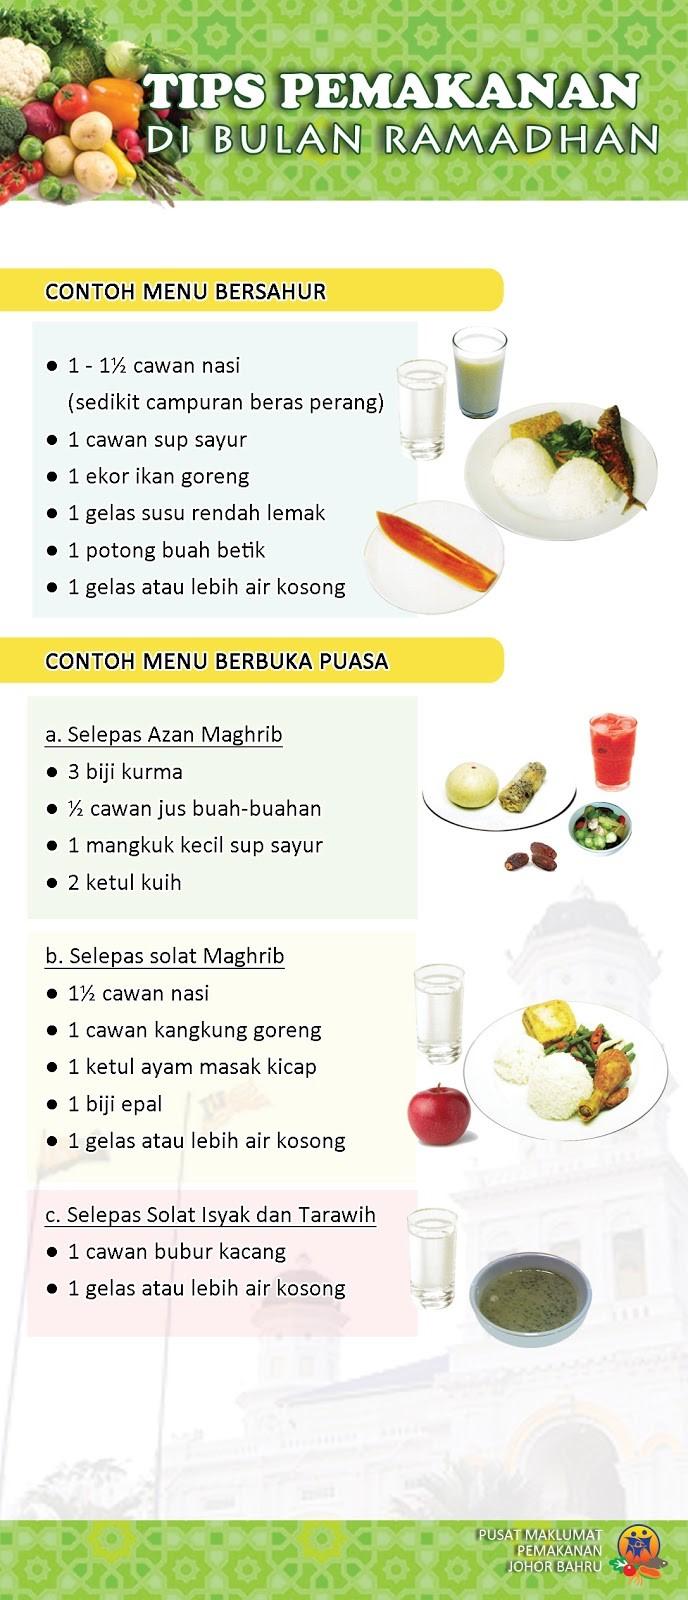 Tips Pemakanan Puasa 2